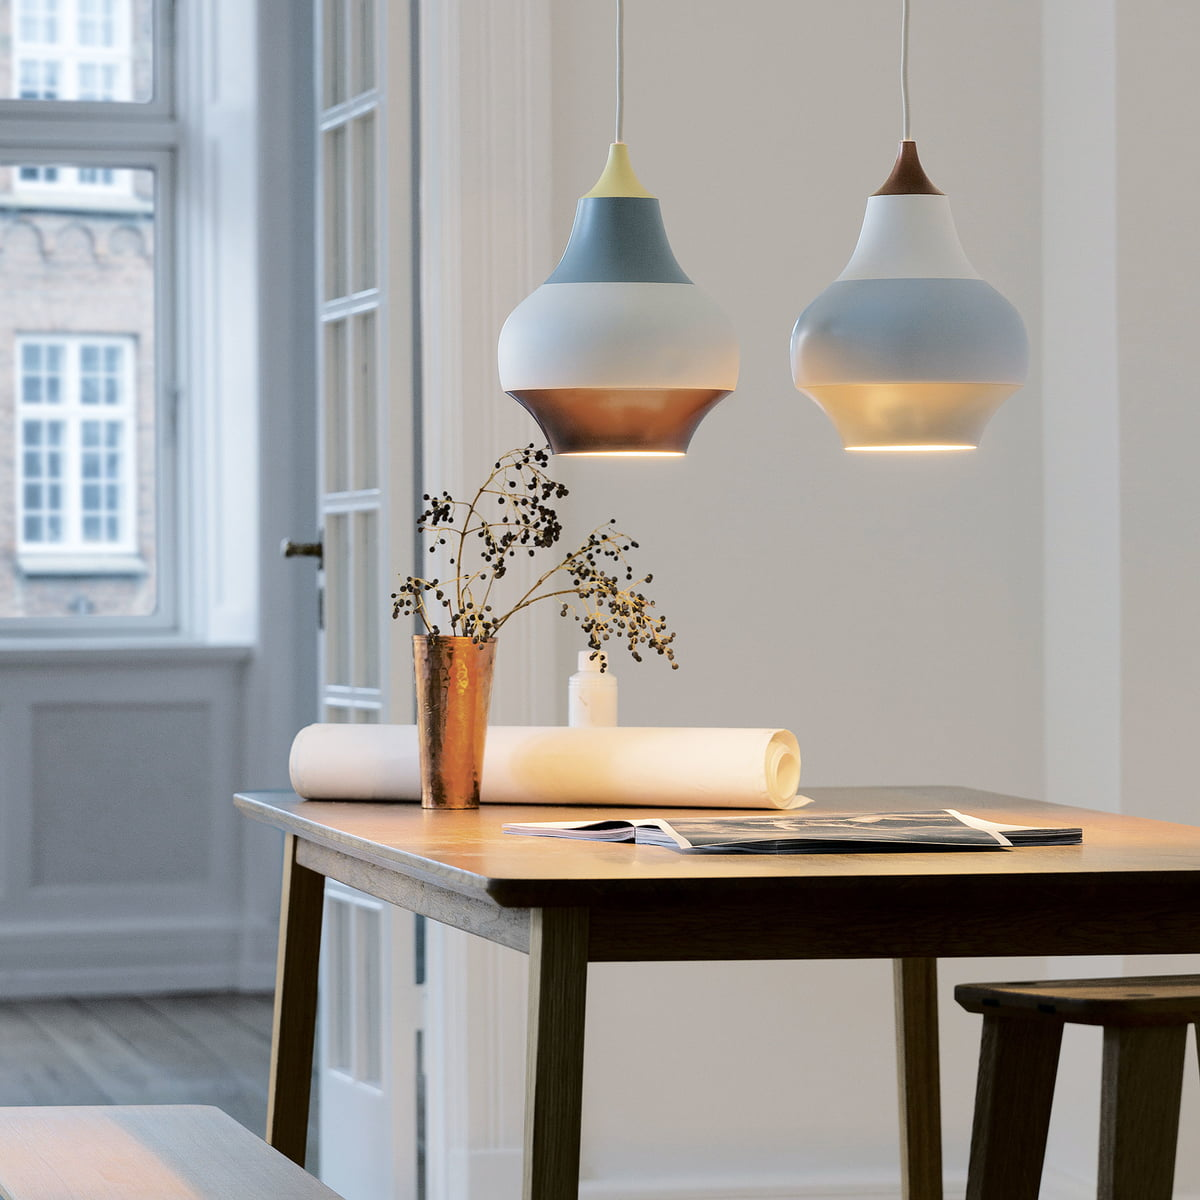 Lampa Louis Poulsen CIRQUE | Lampy dostępne w Internity Home